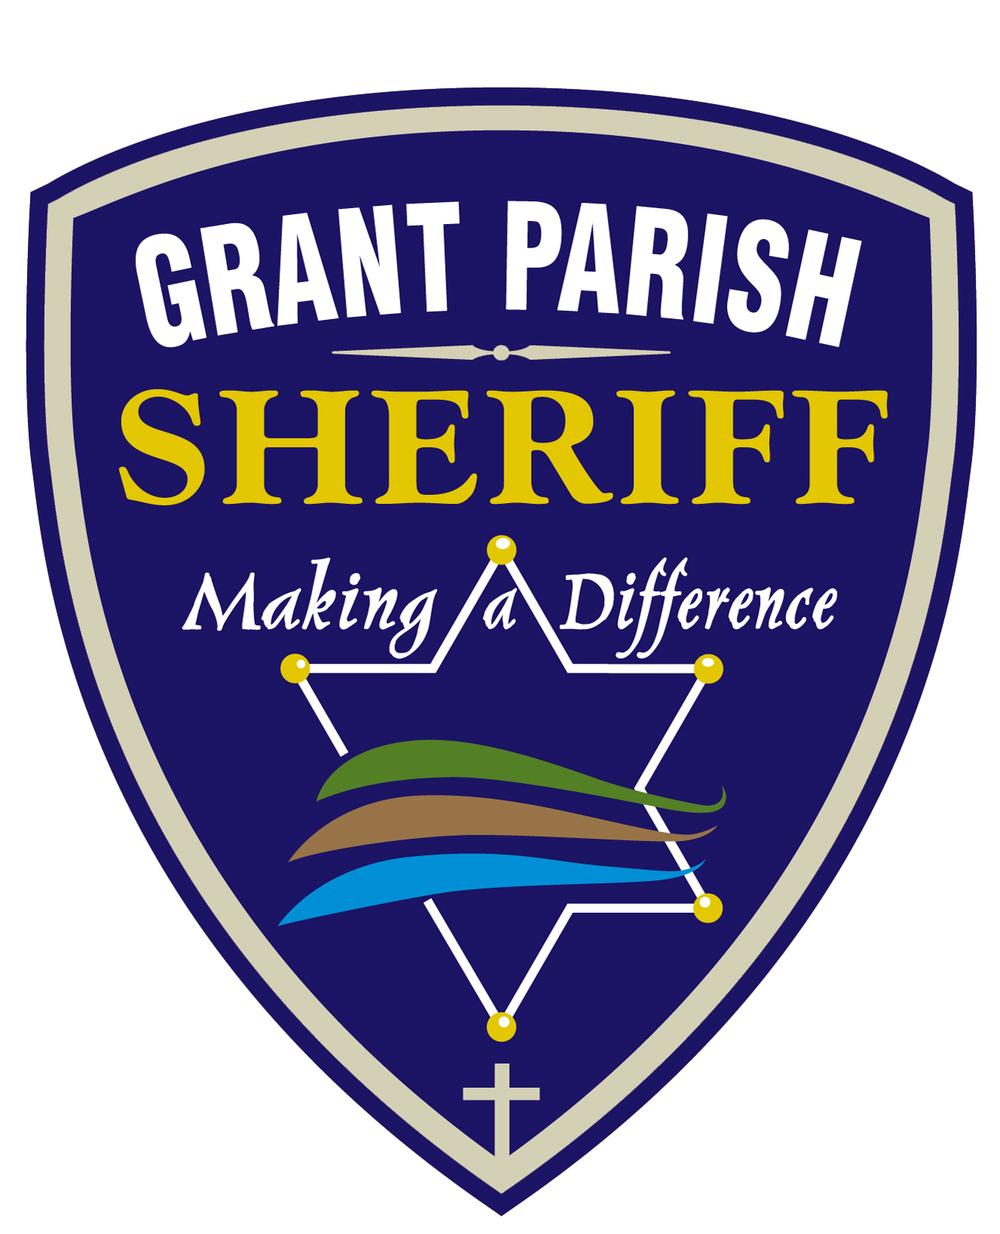 Grant Parish Sheriff's Office